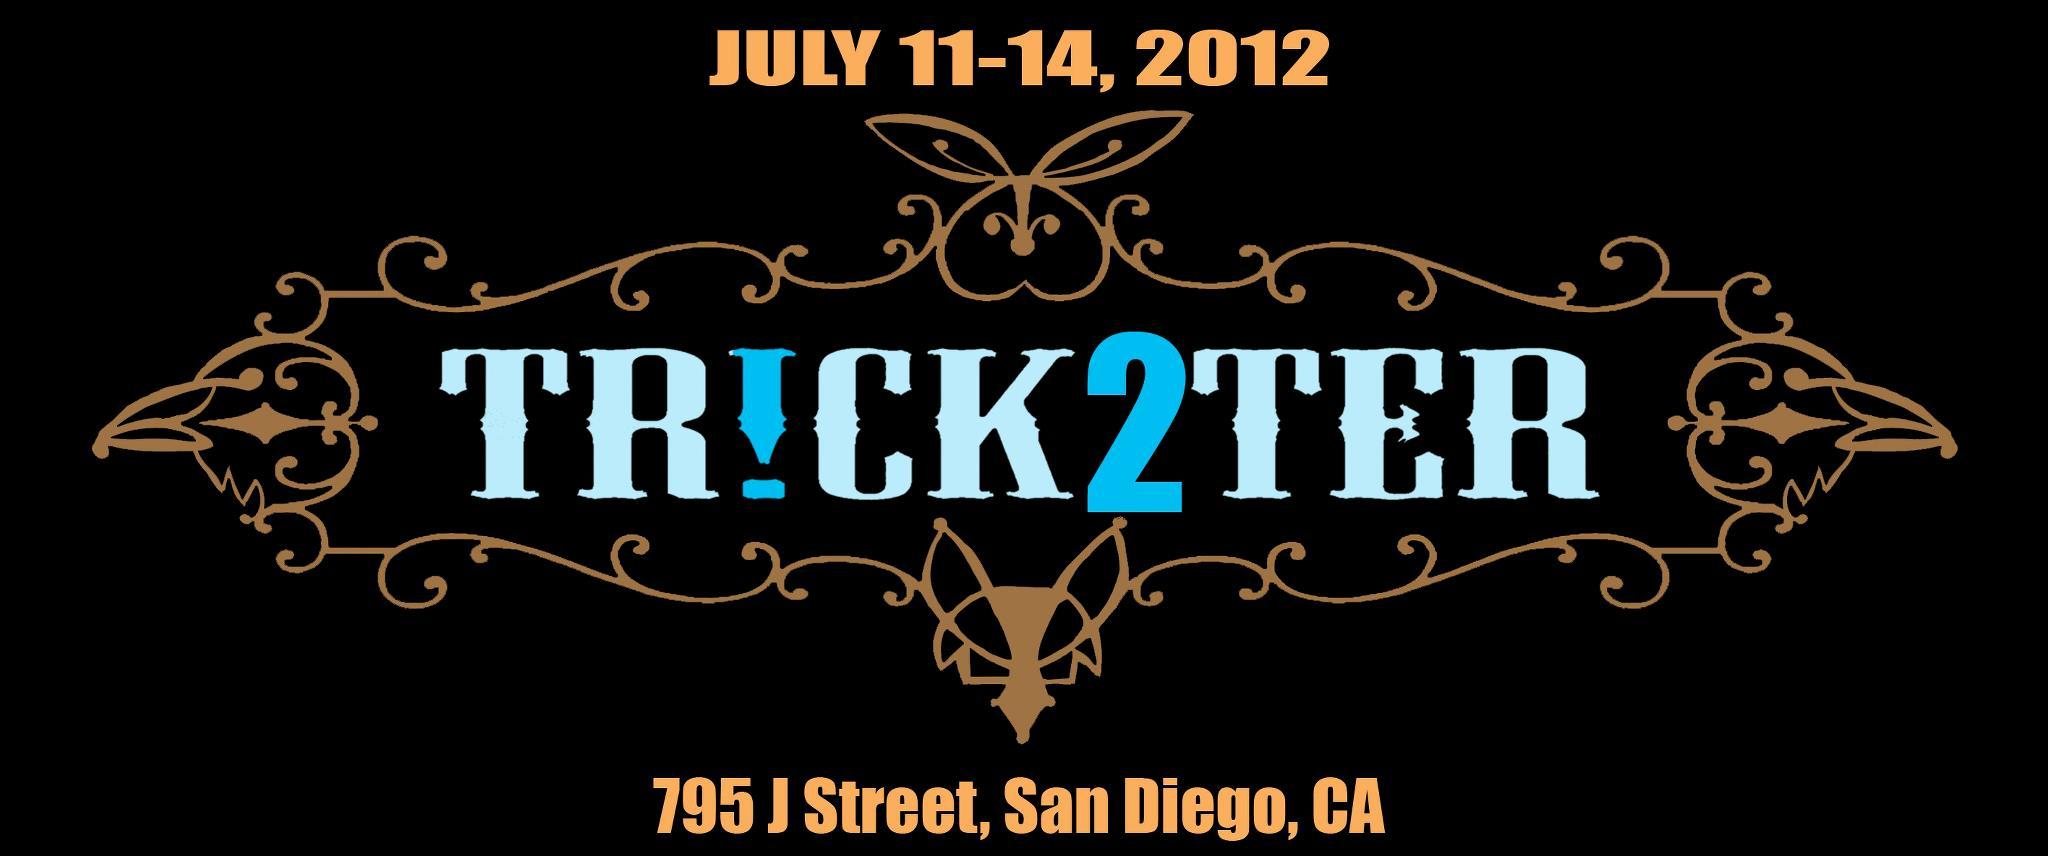 2012-07-08-458012_373995242653852_1297428084_o.jpg